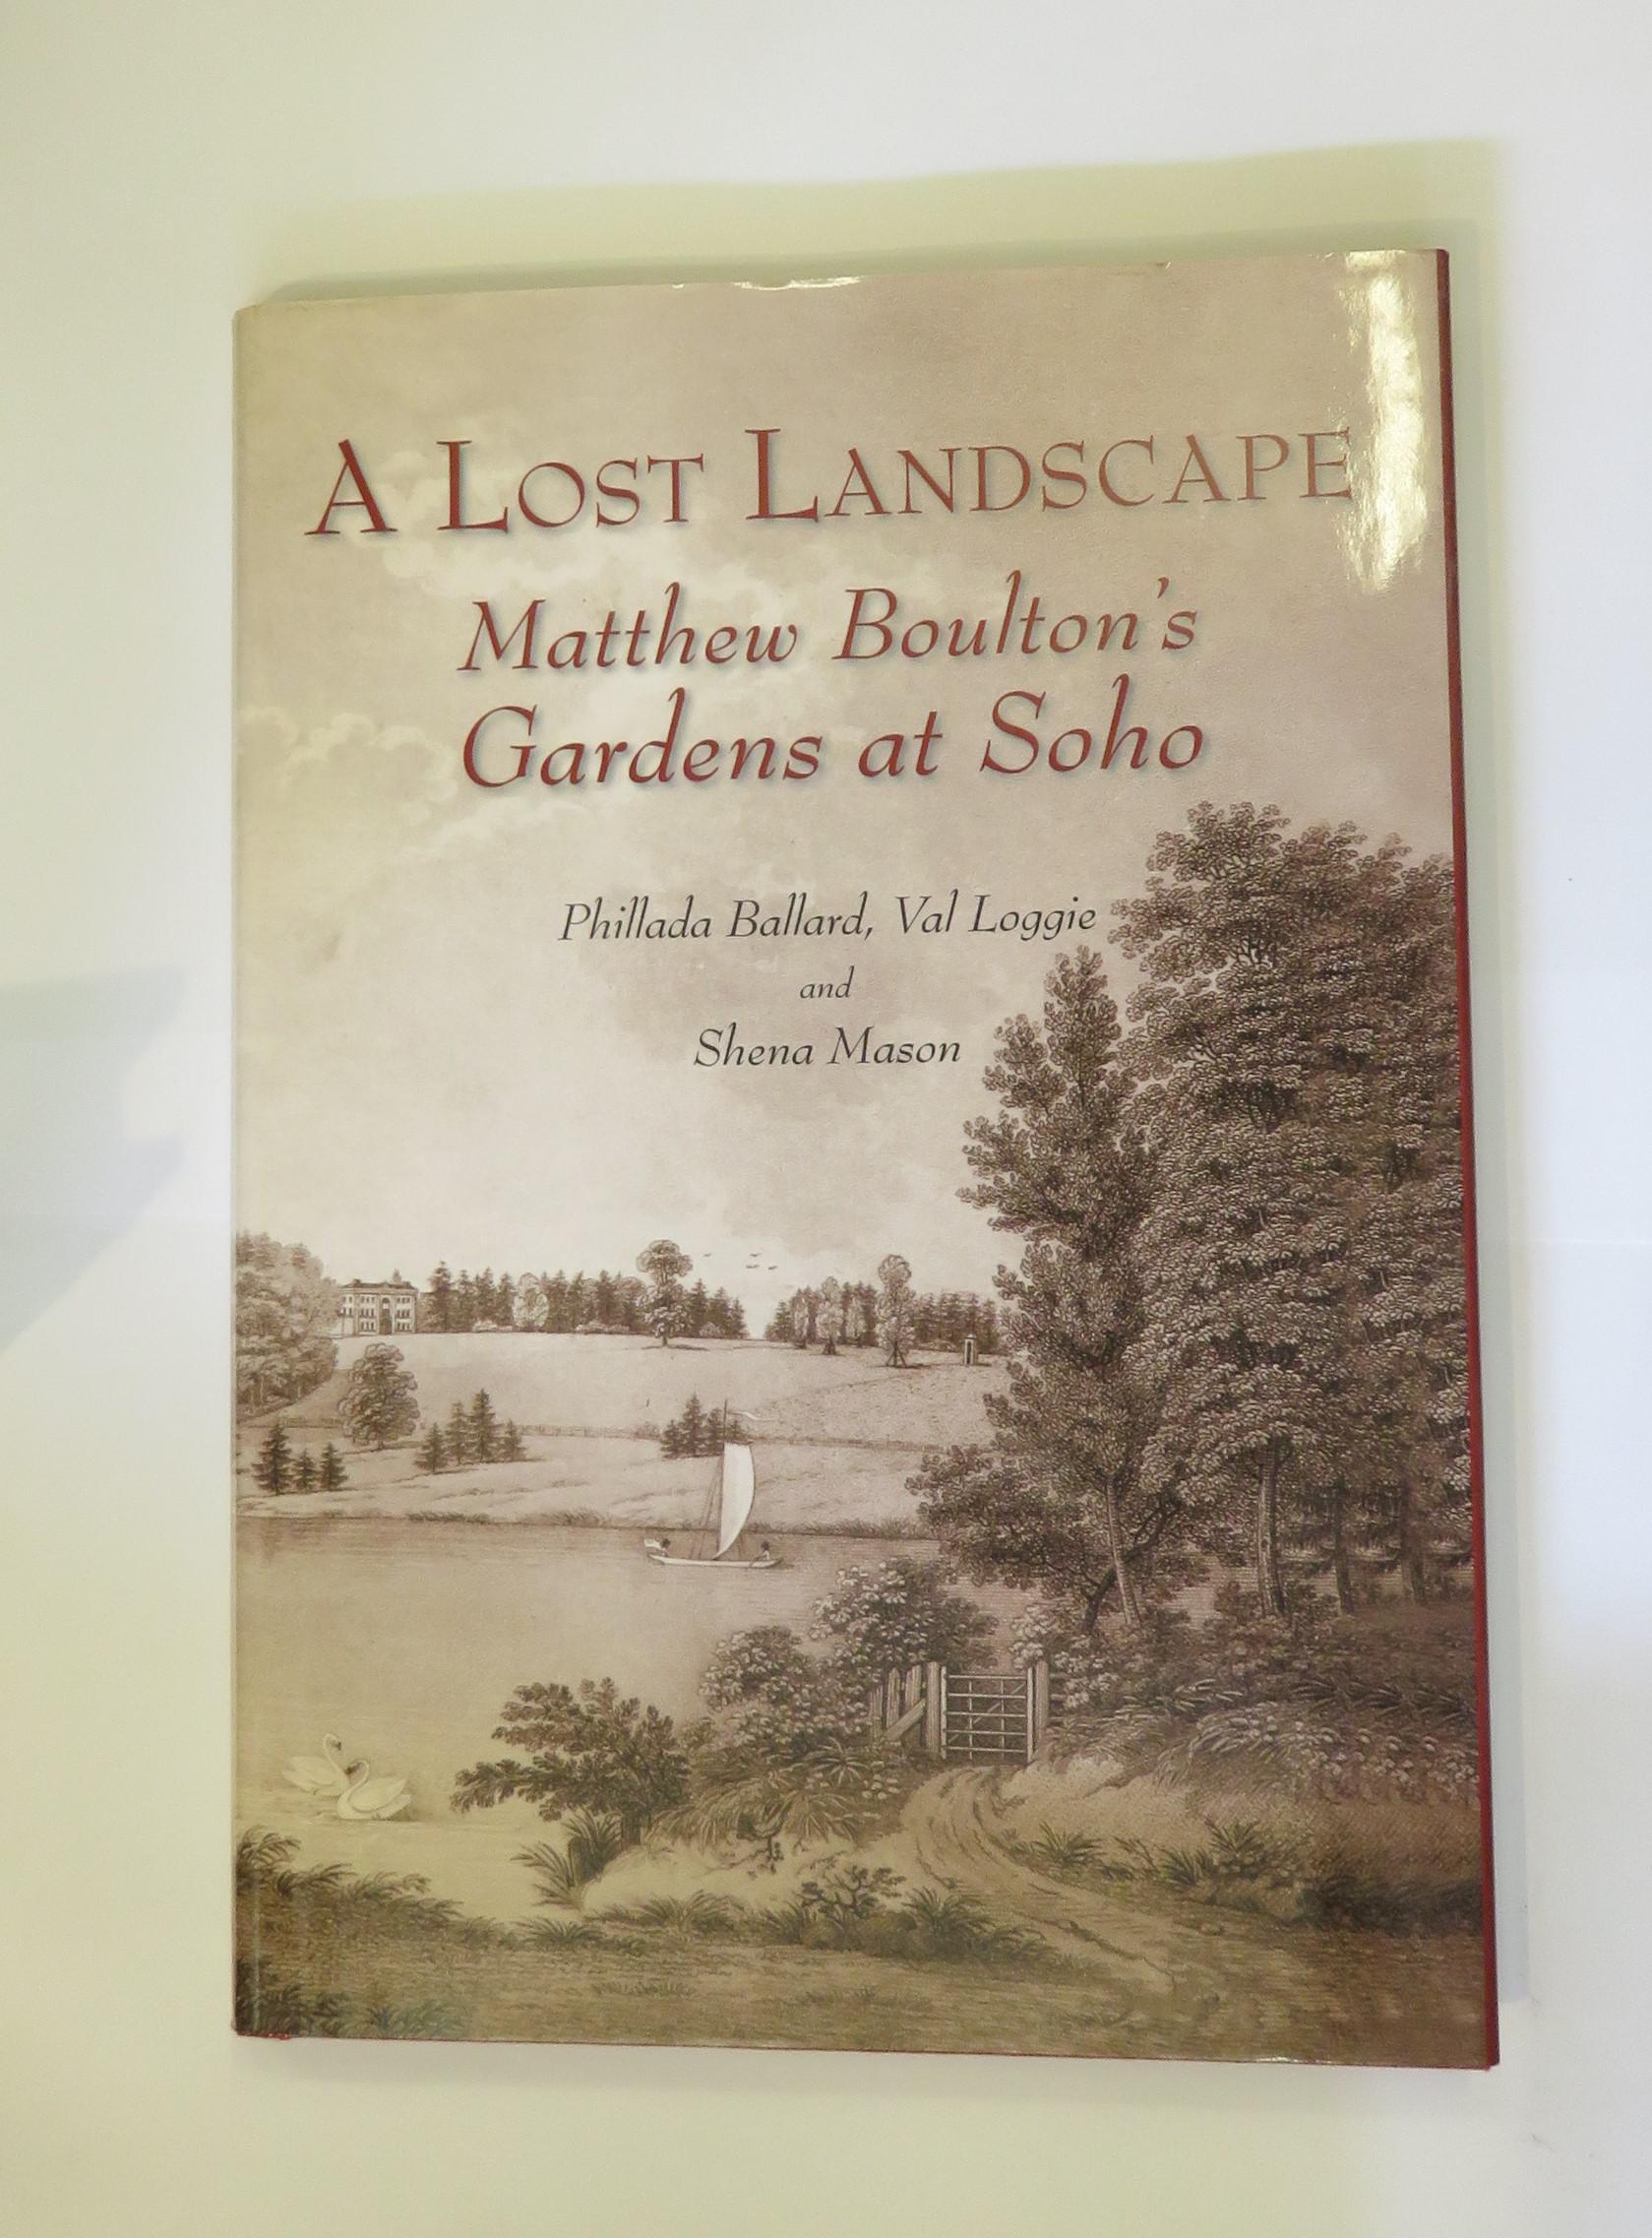 A Lost Landscape: Matthew Boulton's Gardens at Soho